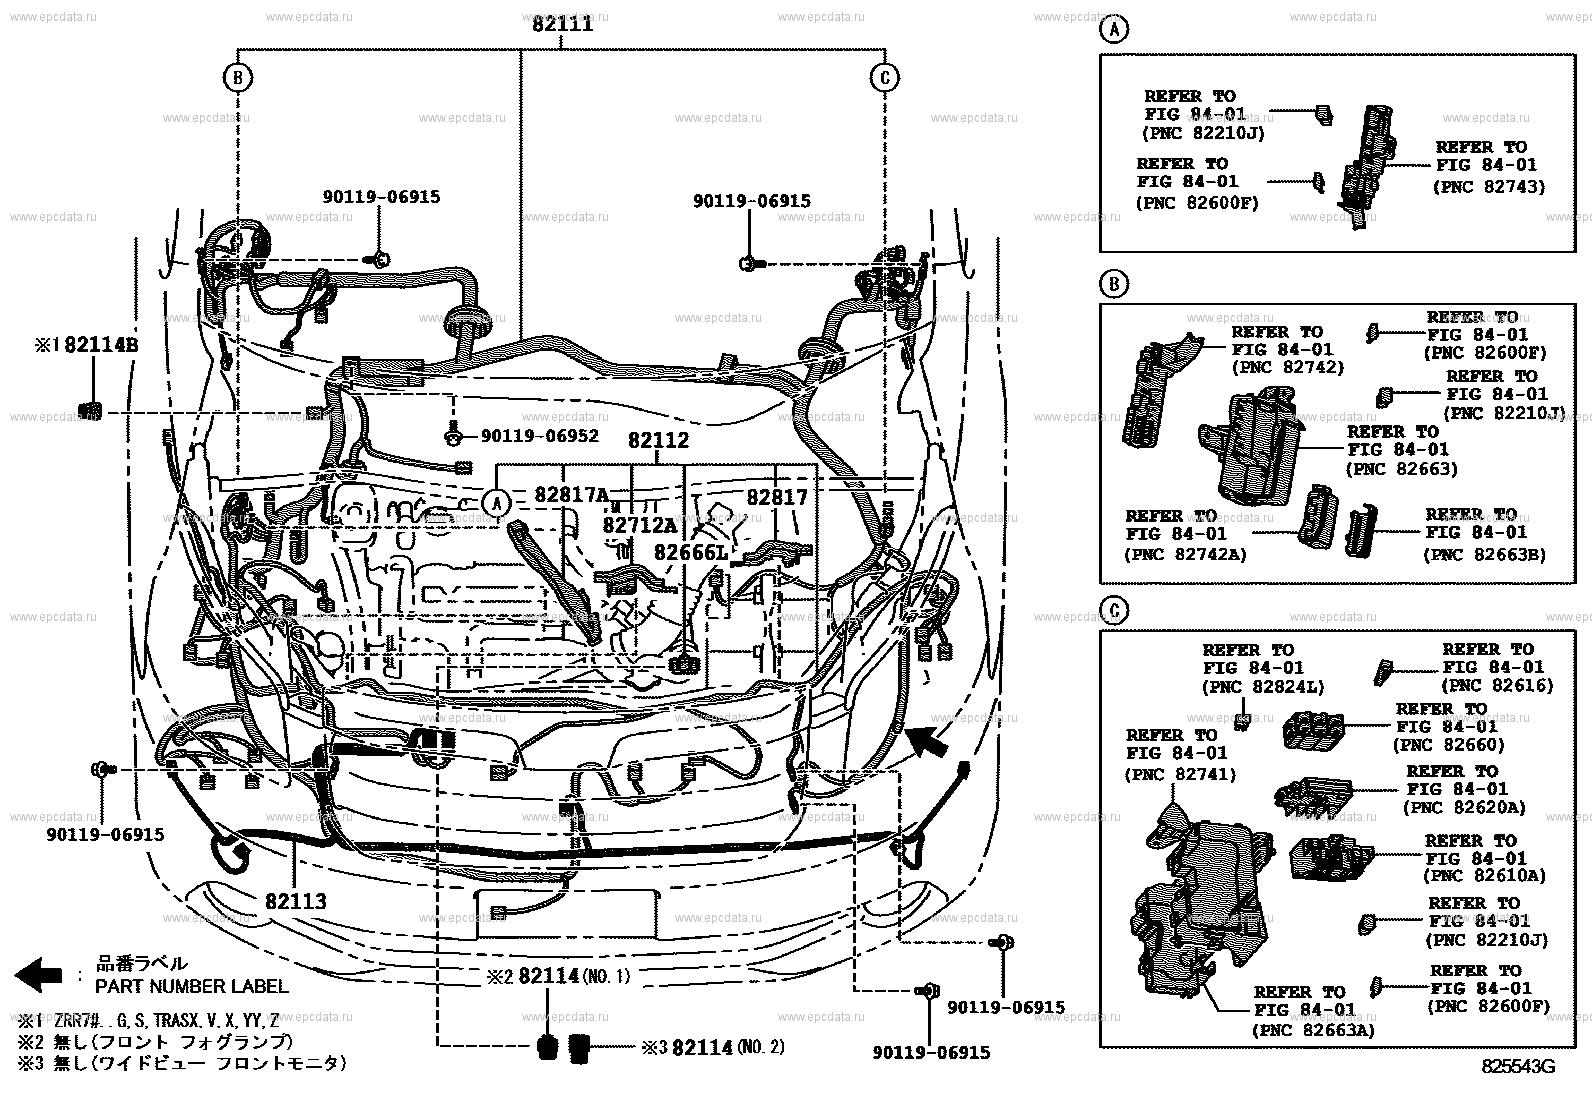 Toyota Noah Wiring Diagram - Linear Encoder Wiring Diagram 5 Wire | Bege Wiring  DiagramBege Place Wiring Diagram